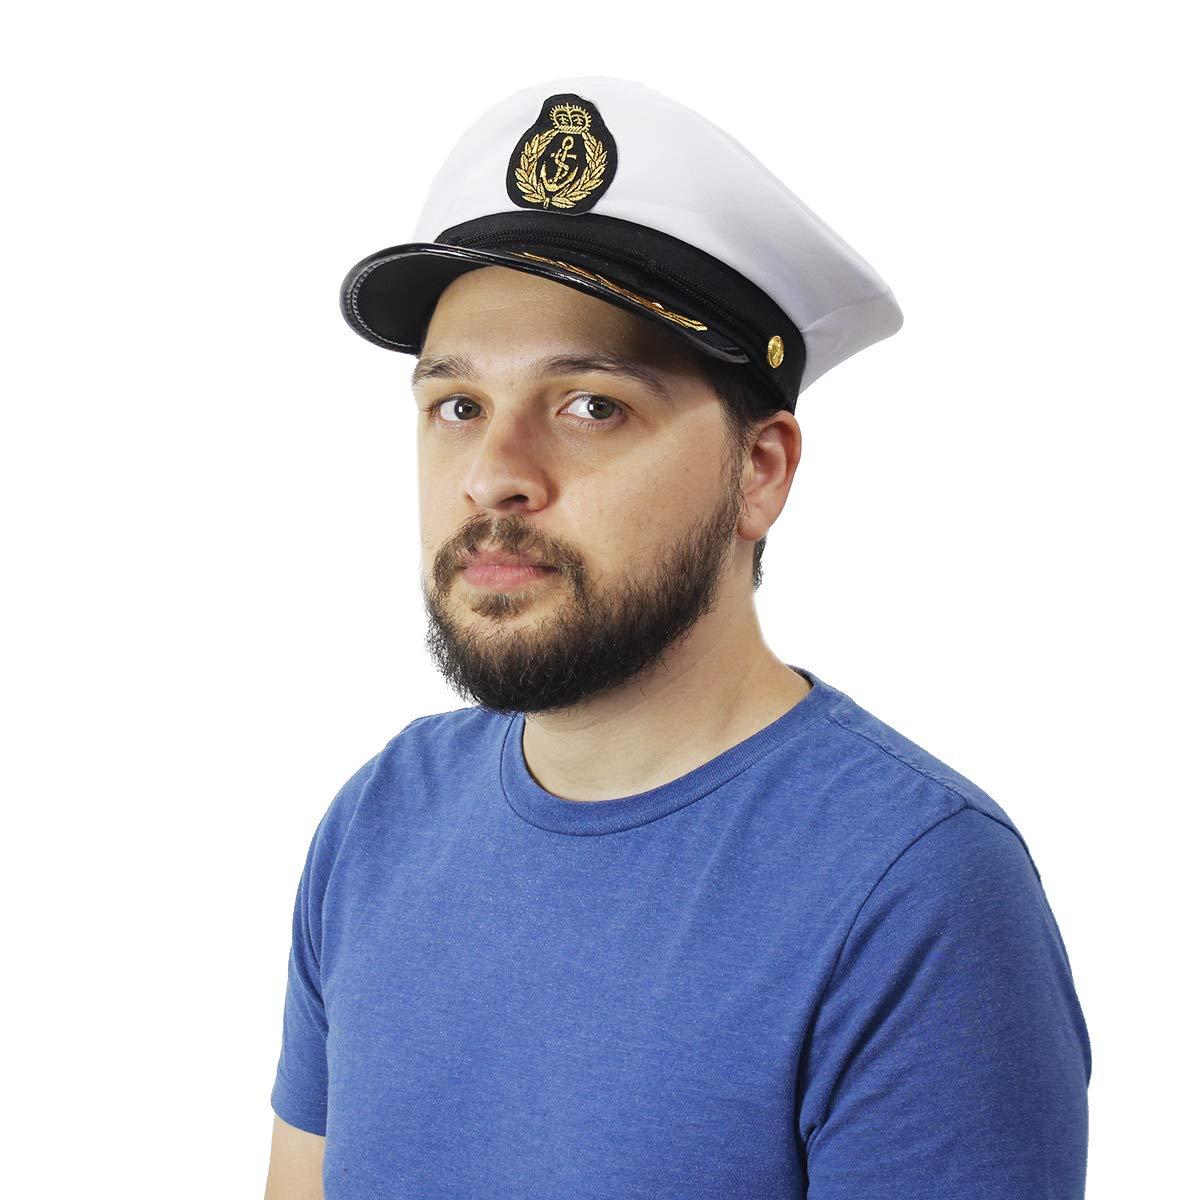 Police 2 Pc Set Sea Captain Hats For Halloween Pretend Play Juvale Costume Headwear